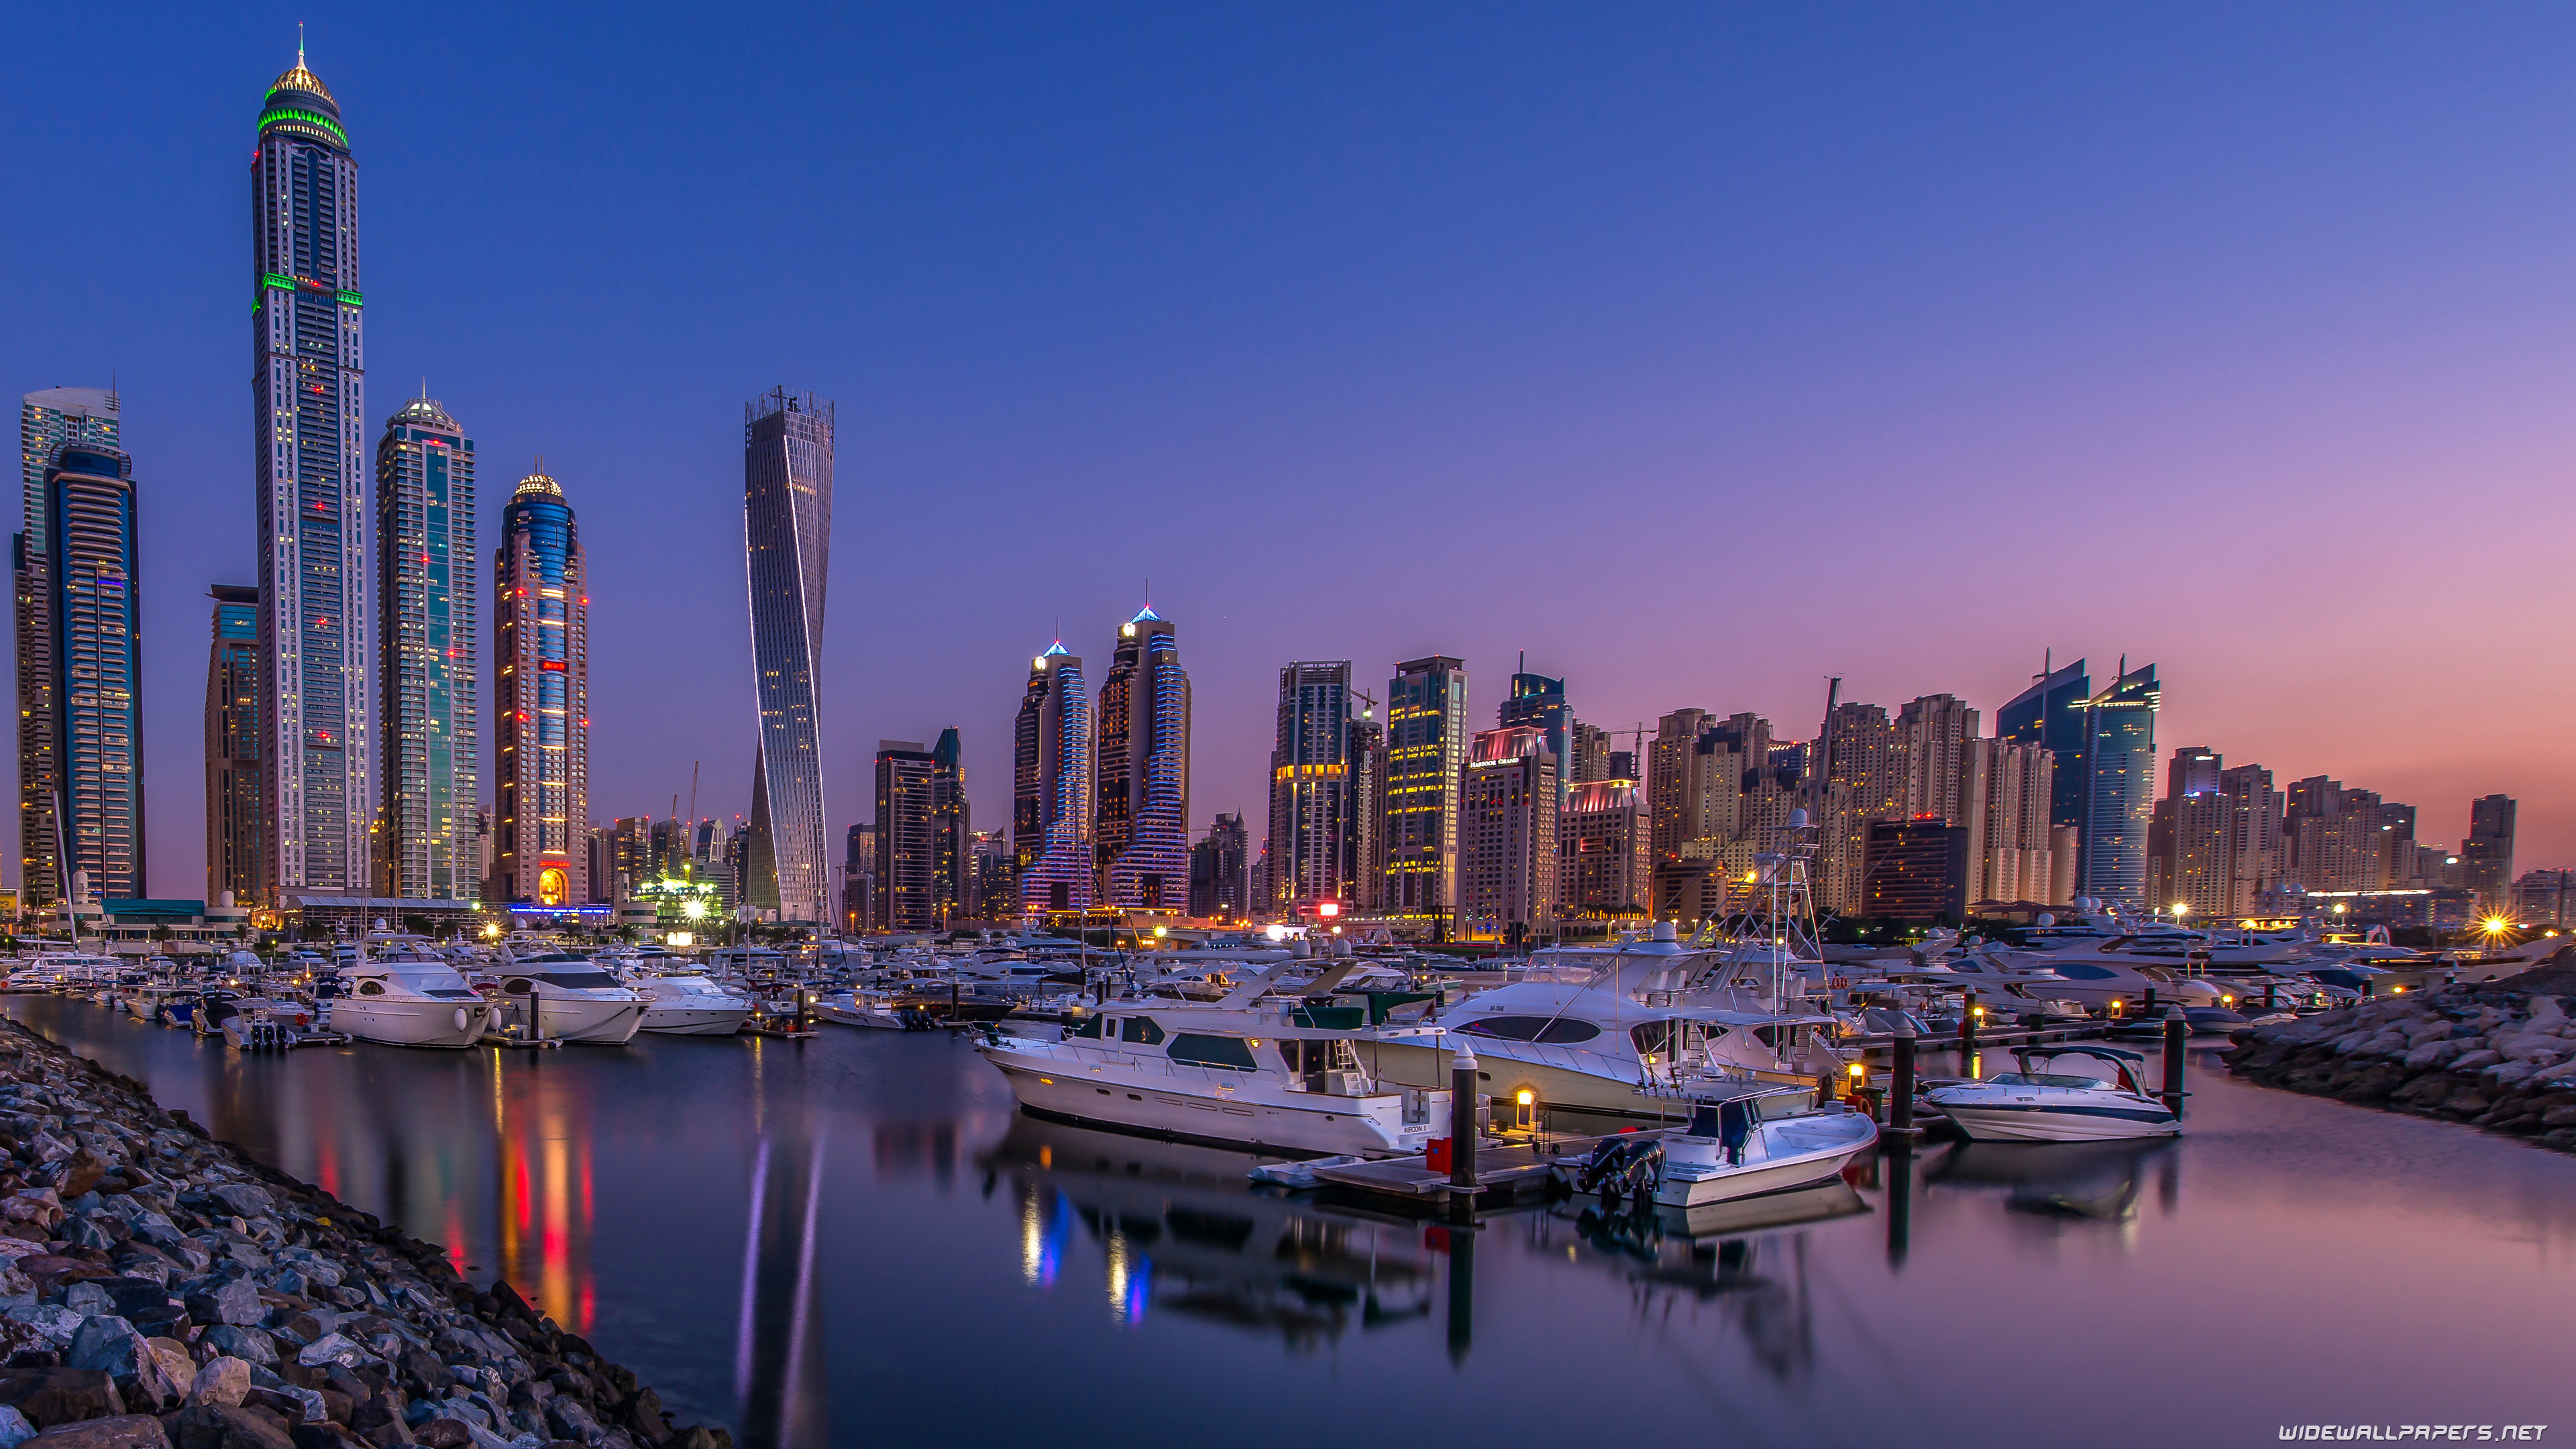 Dubai Desktop Wallpapers 4k Ultra Hd 2 - Dubai Skyline Wallpaper 4k , HD Wallpaper & Backgrounds